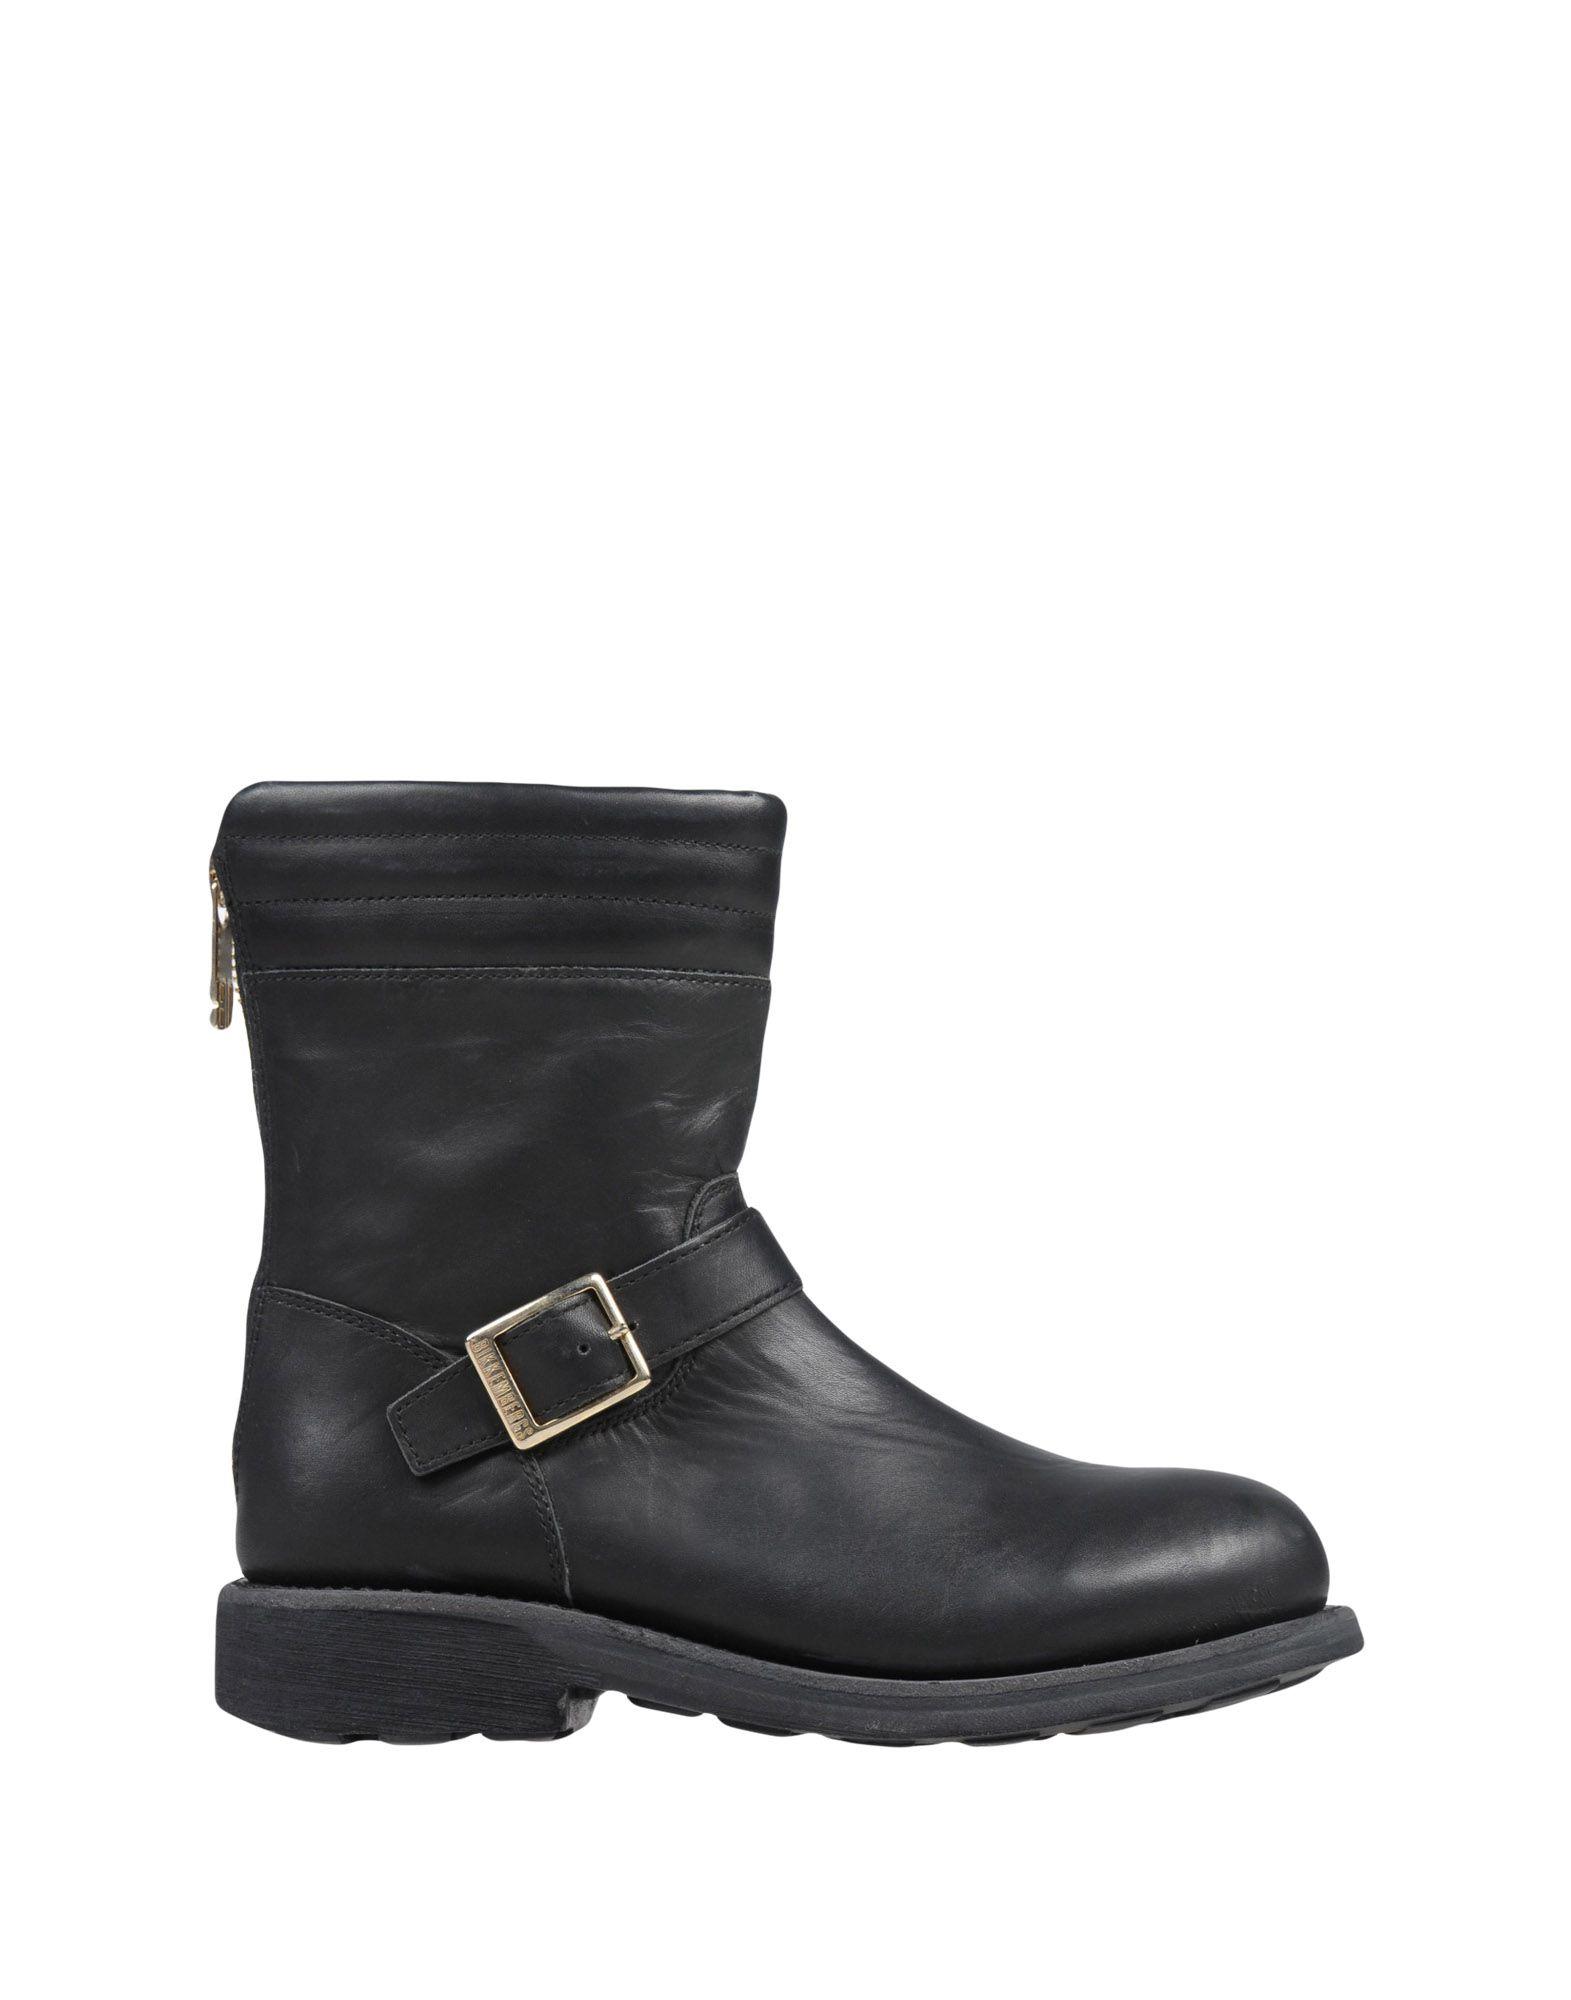 Stilvolle billige Schuhe Bikkembergs Stiefelette Damen  11418048UV